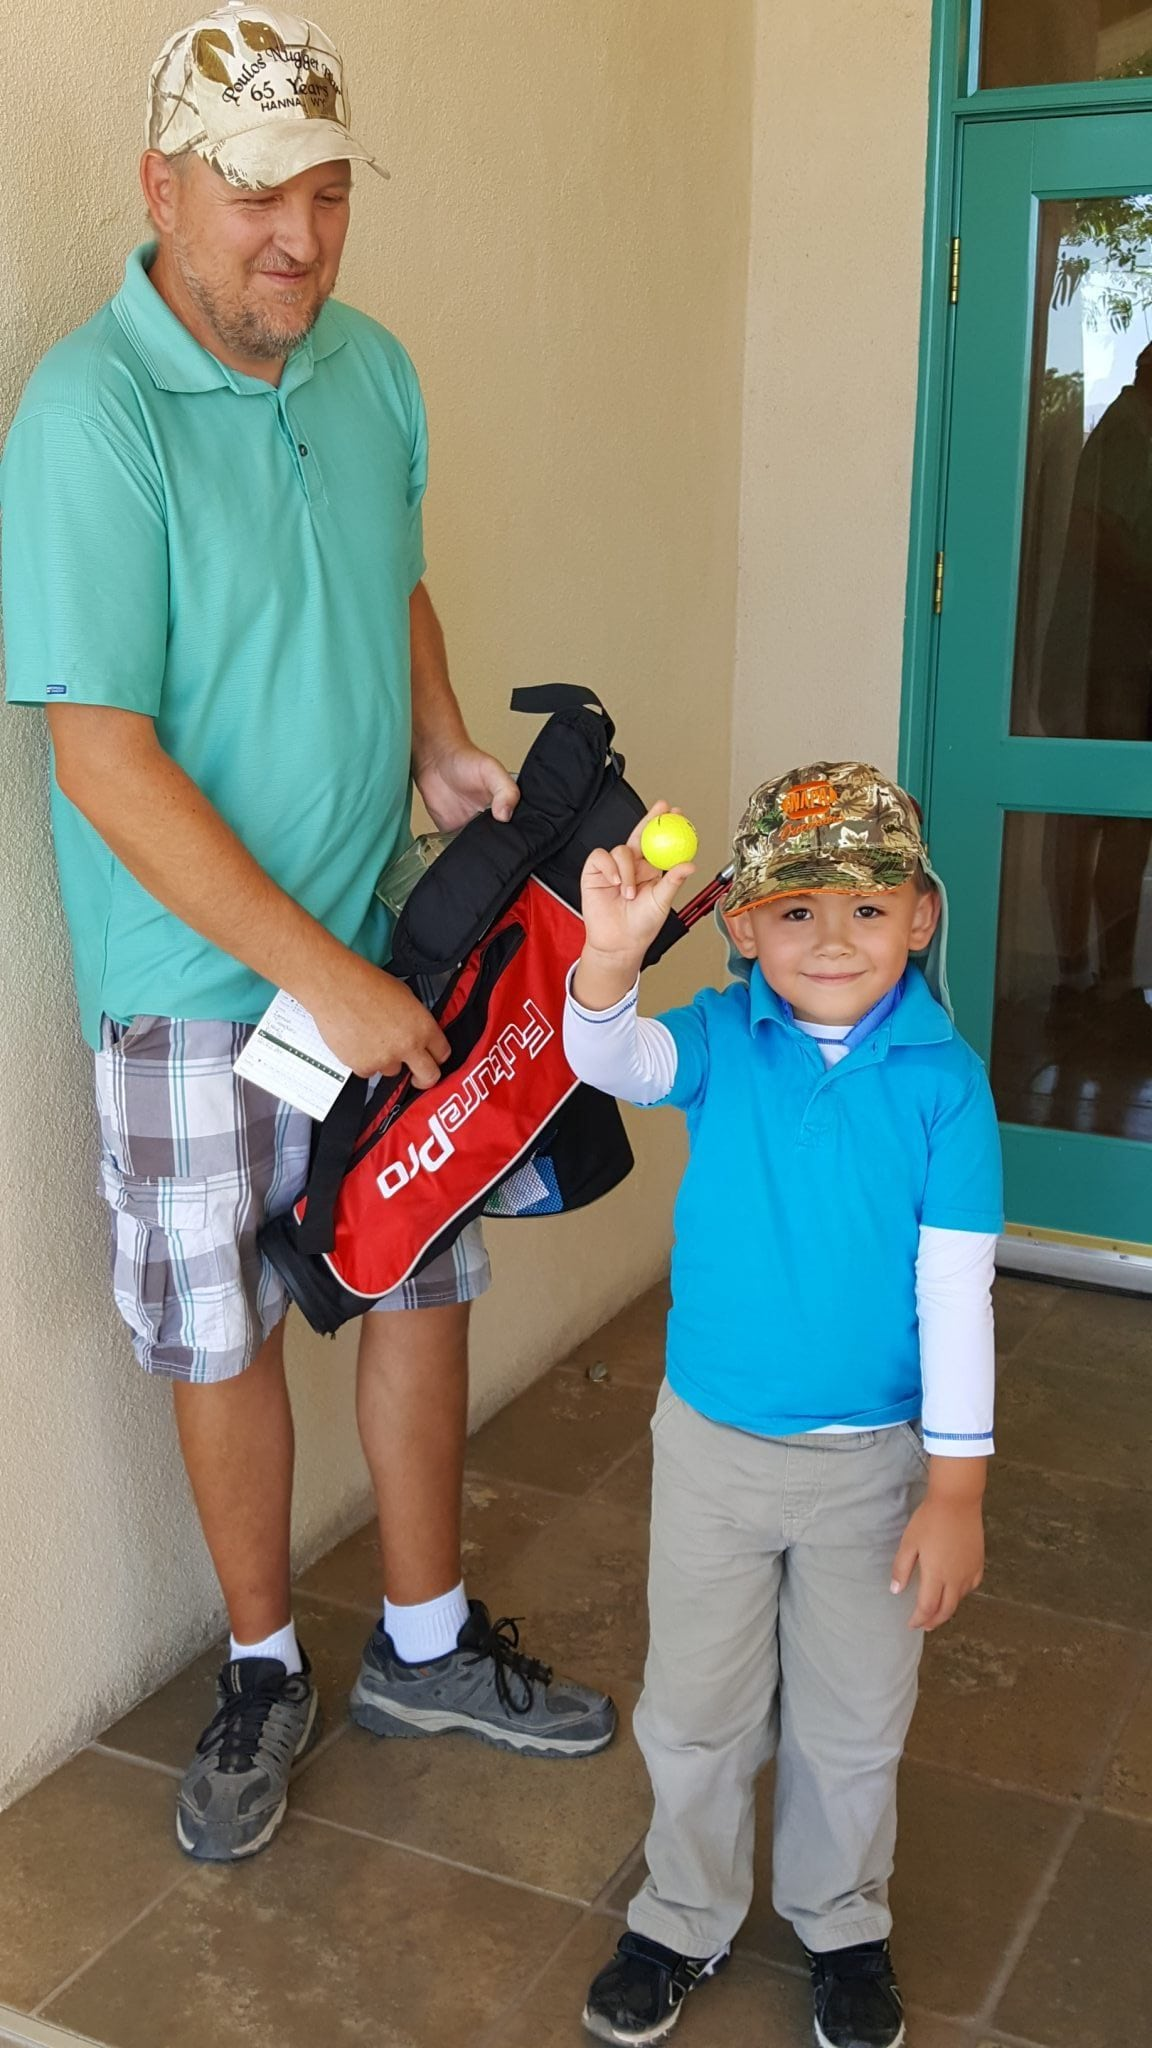 Junior golfers play tournament series